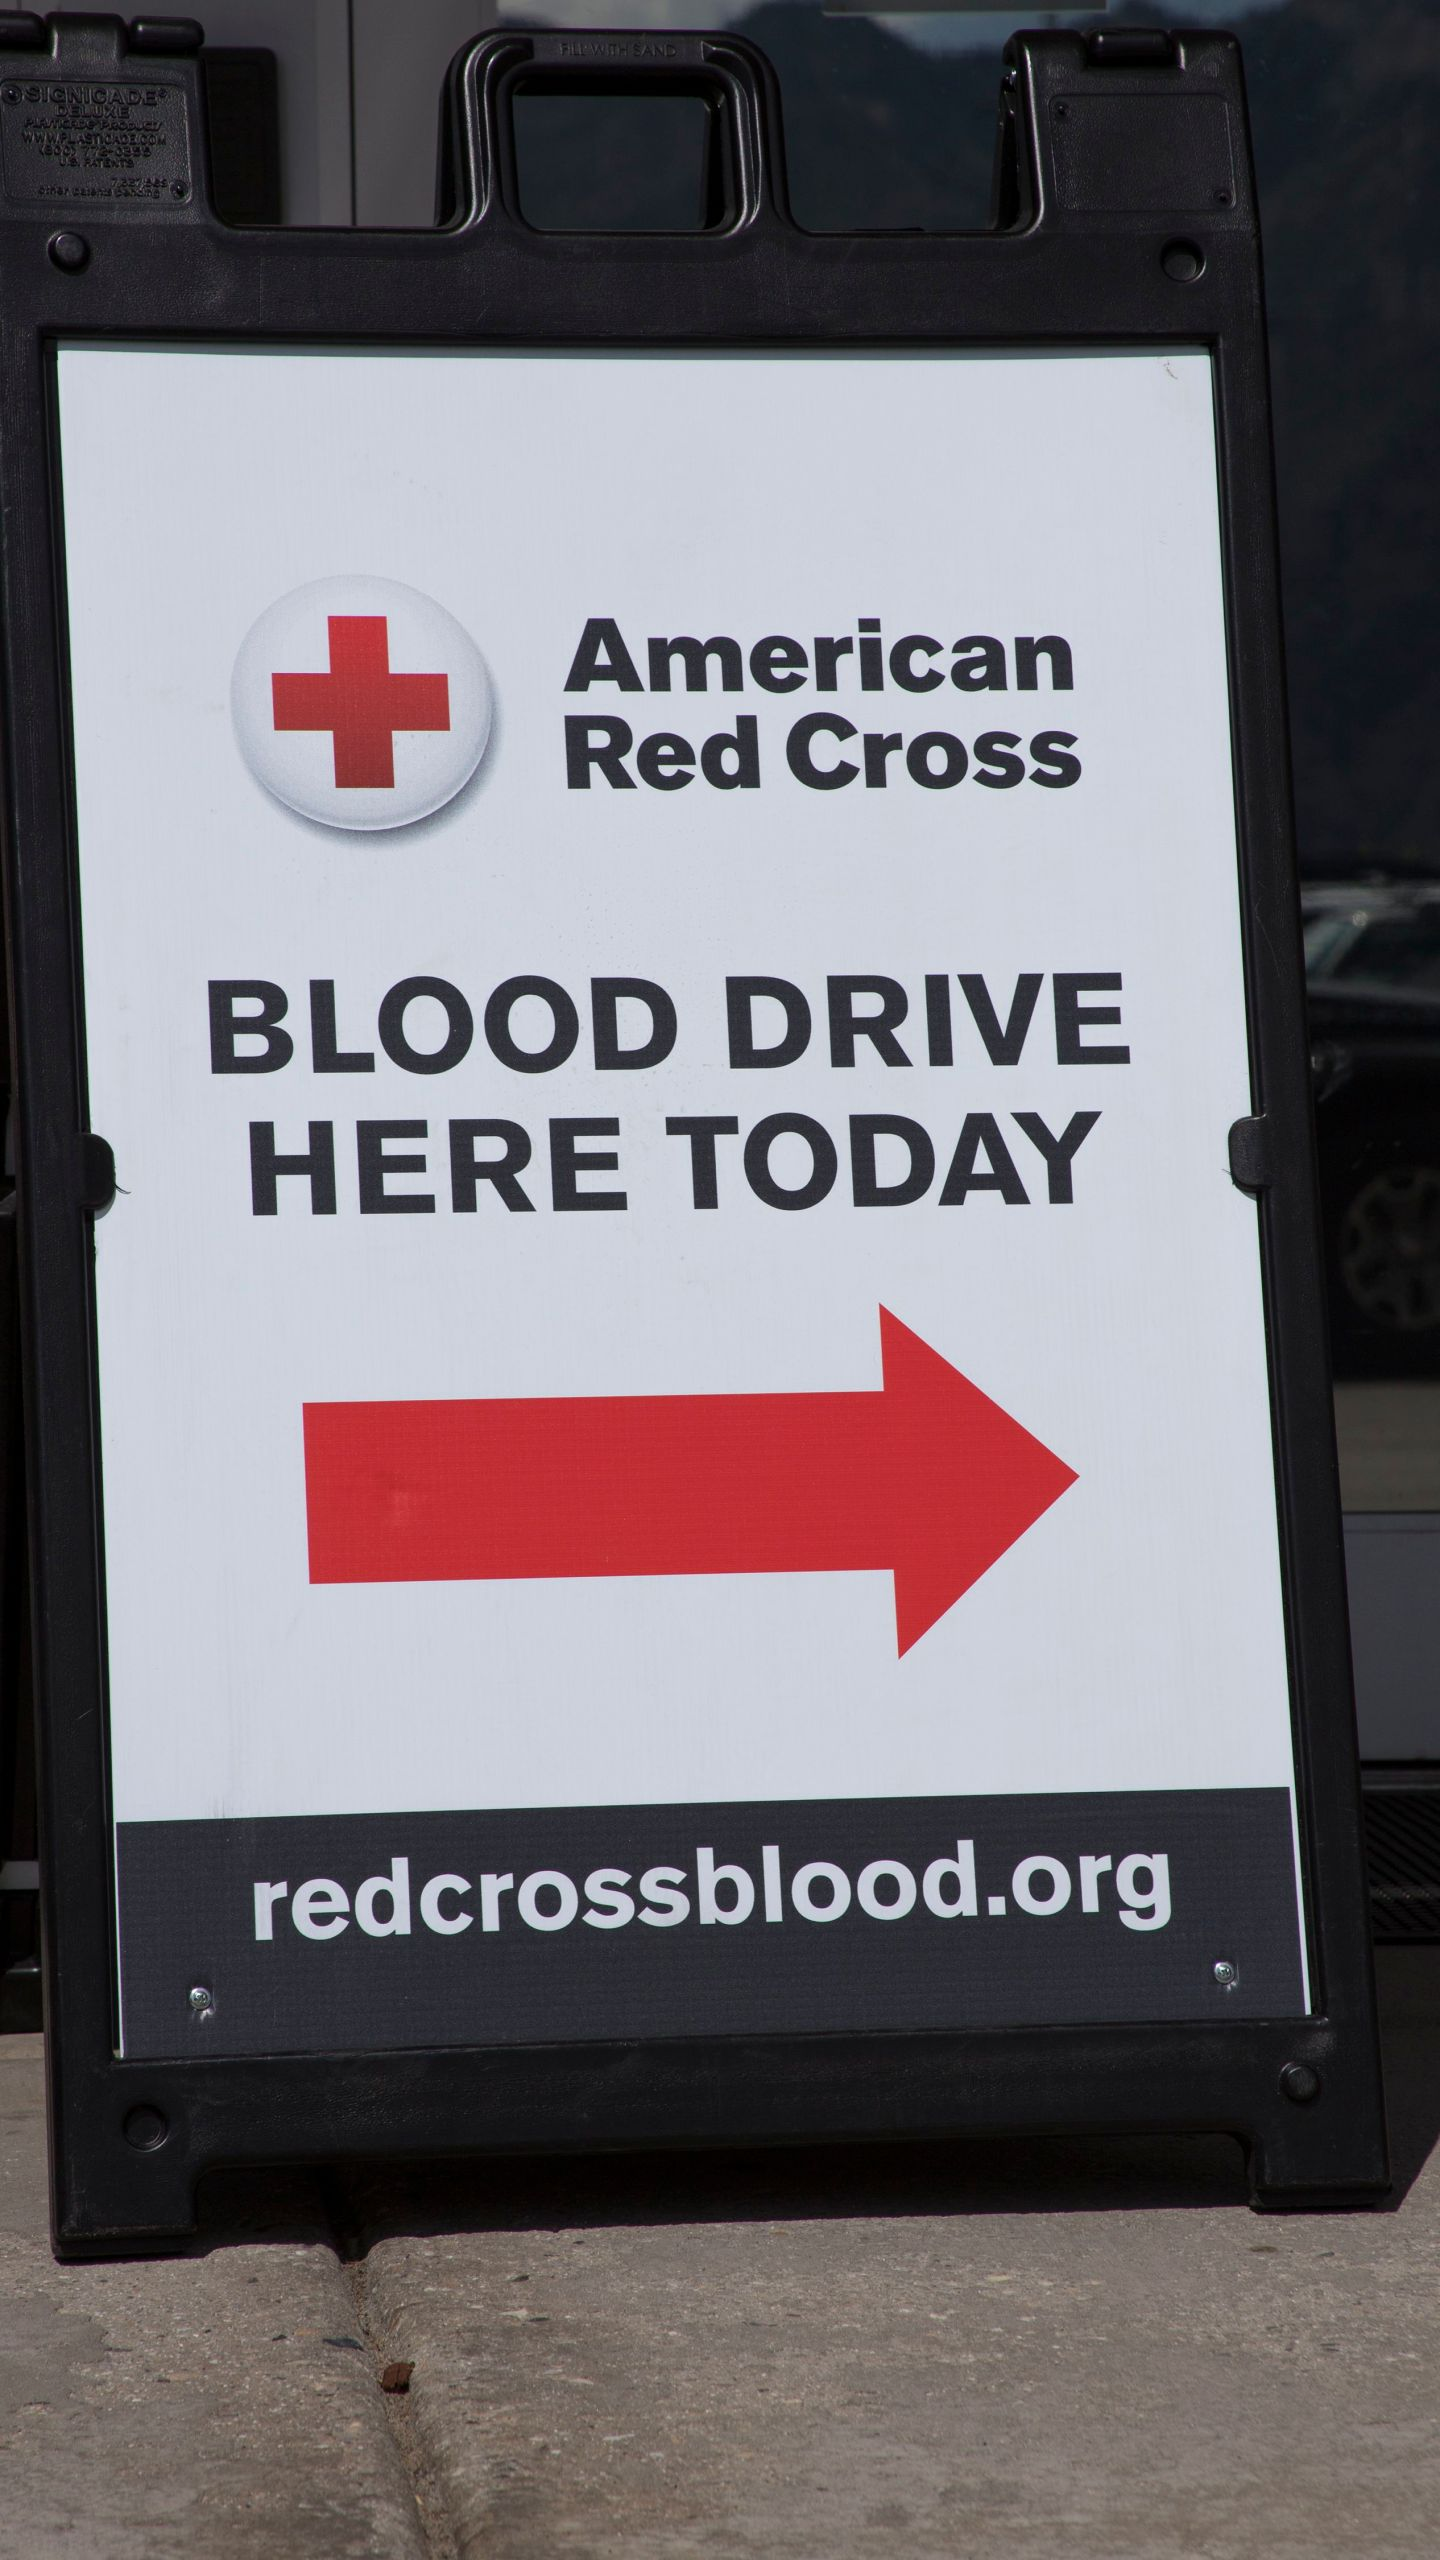 RedCross_BloodDriveSign_1542132068712.jpg